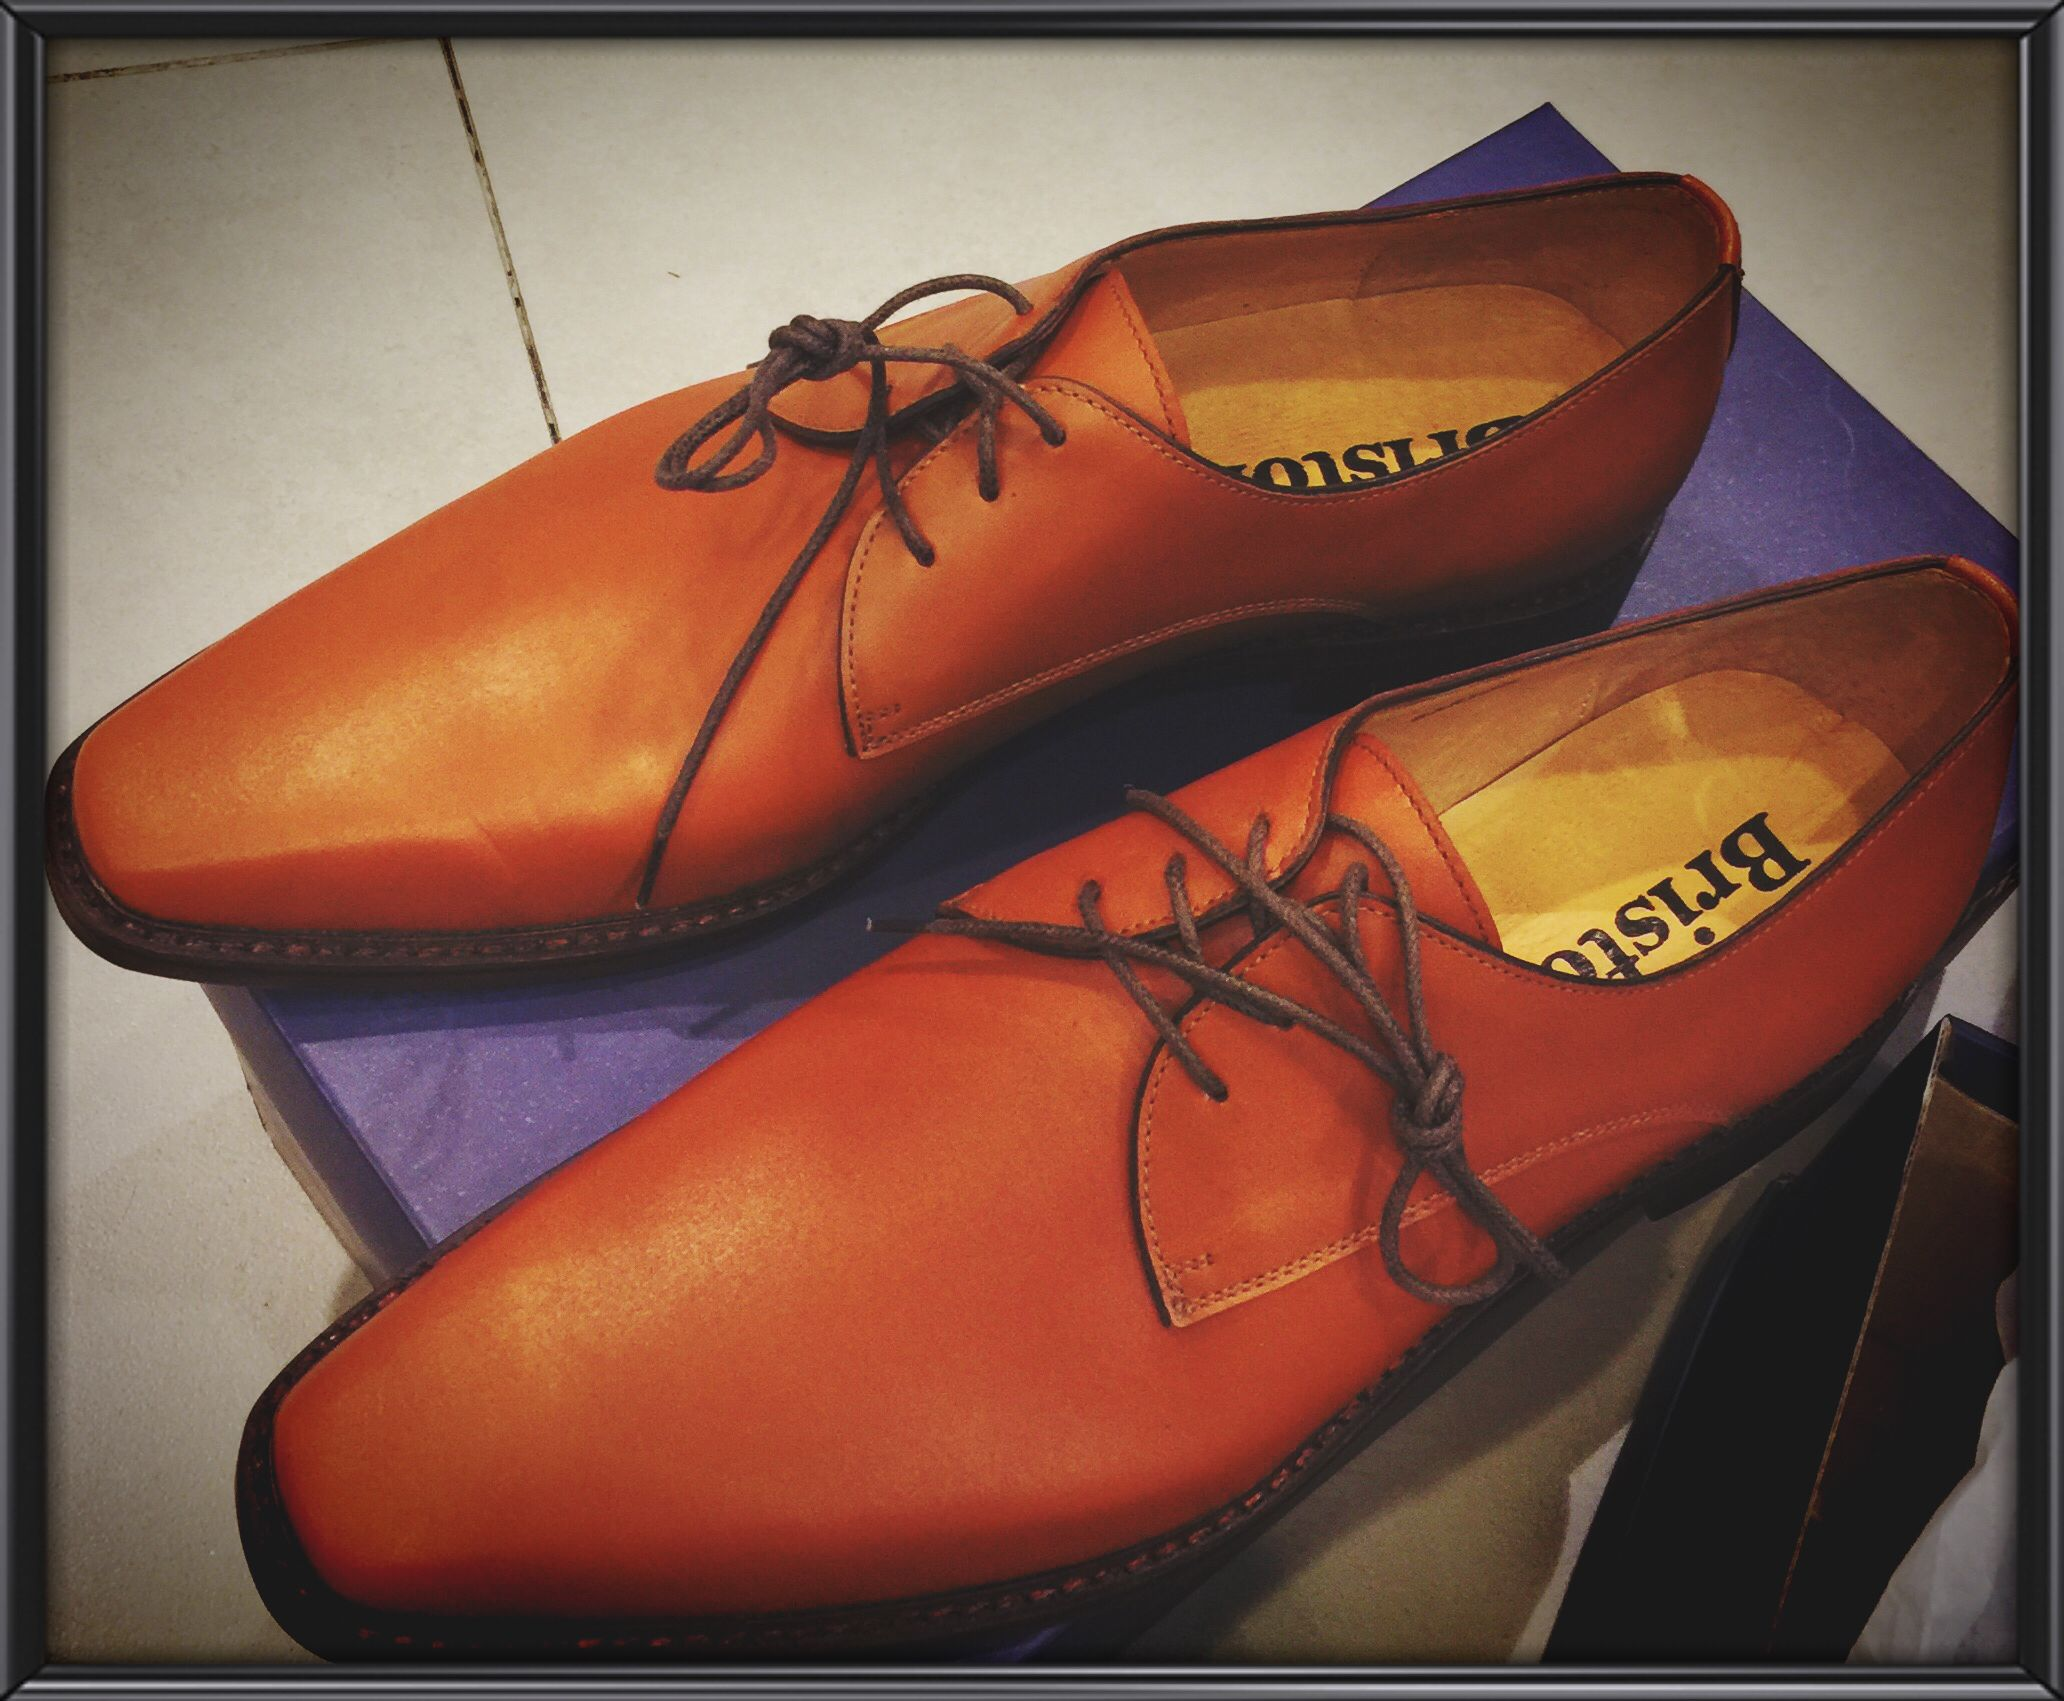 Barion bristol marikina shoes philippines fancied pinterest barion bristol marikina shoes philippines stopboris Images